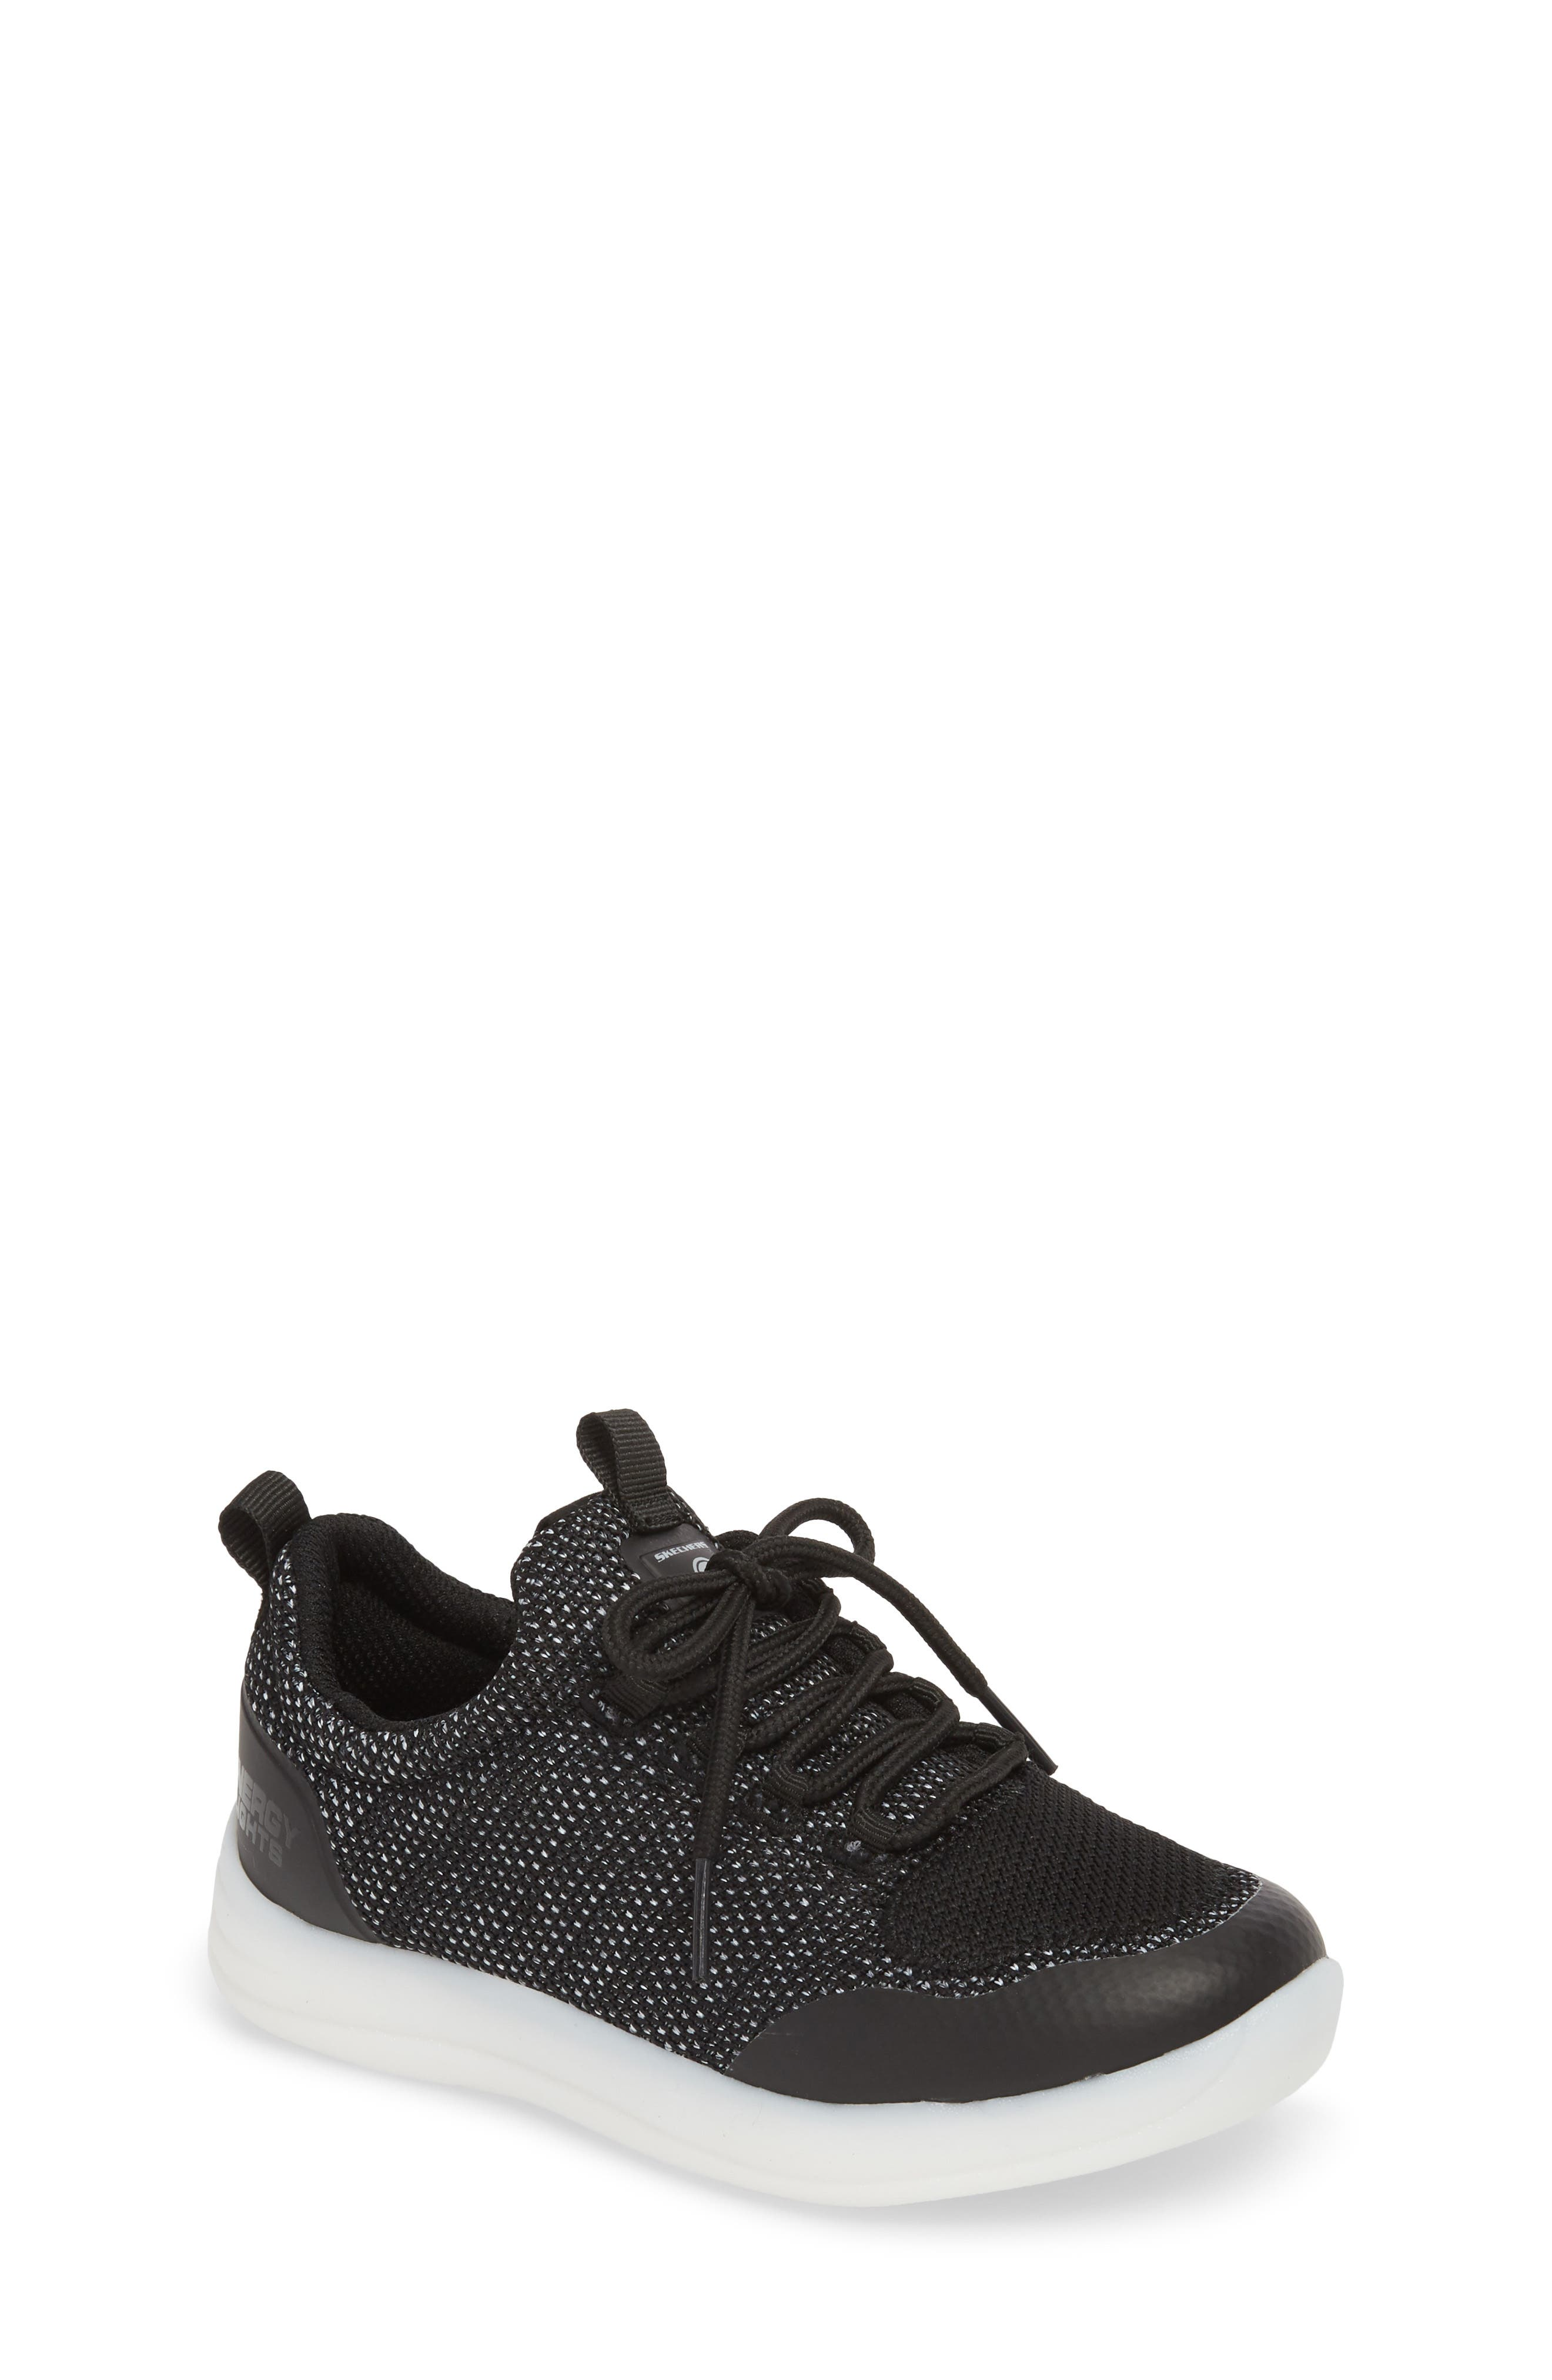 Energy Lights Street Sneaker,                             Main thumbnail 1, color,                             Black